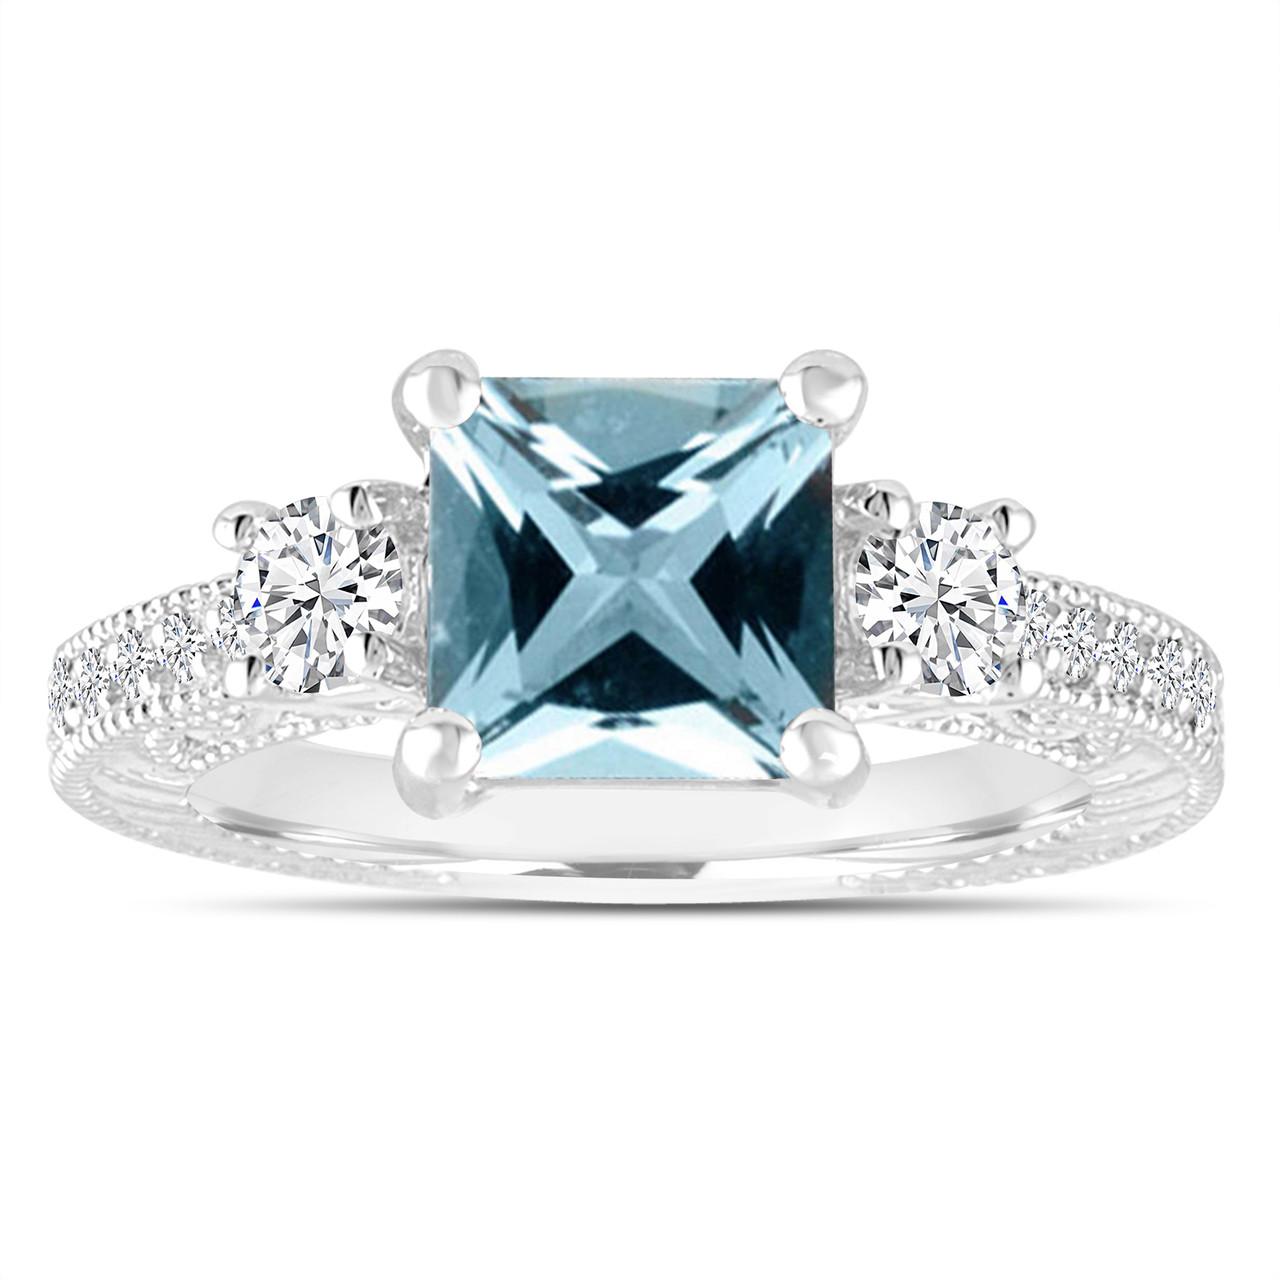 Why You Should Buy From Garo Celik: Vintage Aquamarine Wedding Ring At Websimilar.org